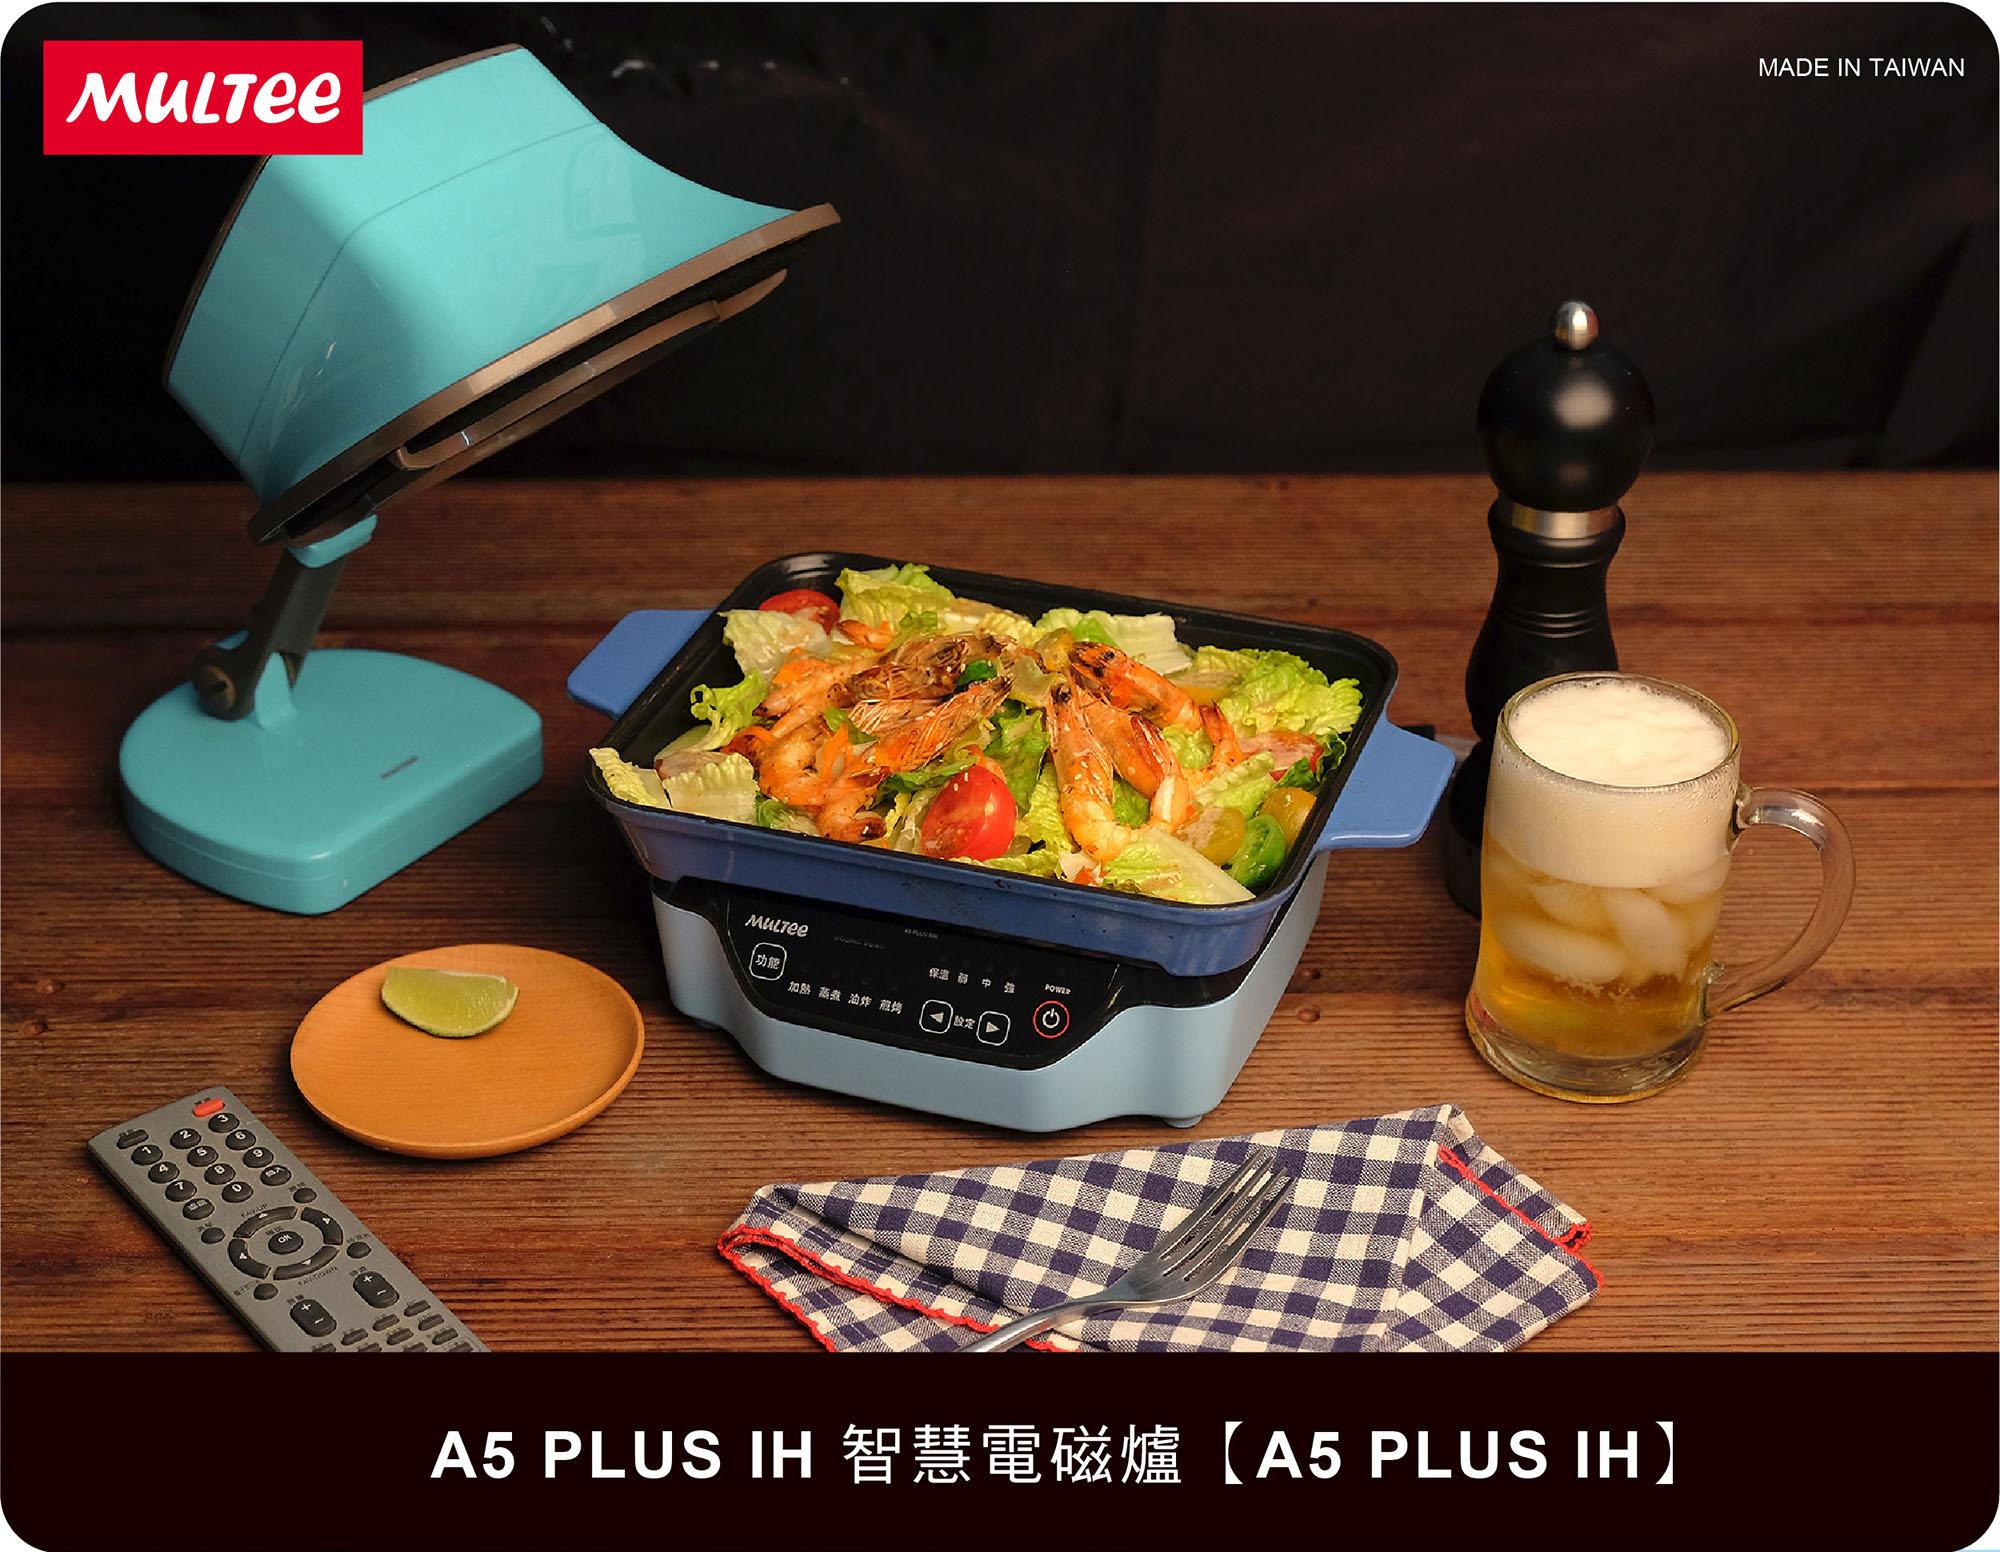 A5 PLUS IH-01.jpg